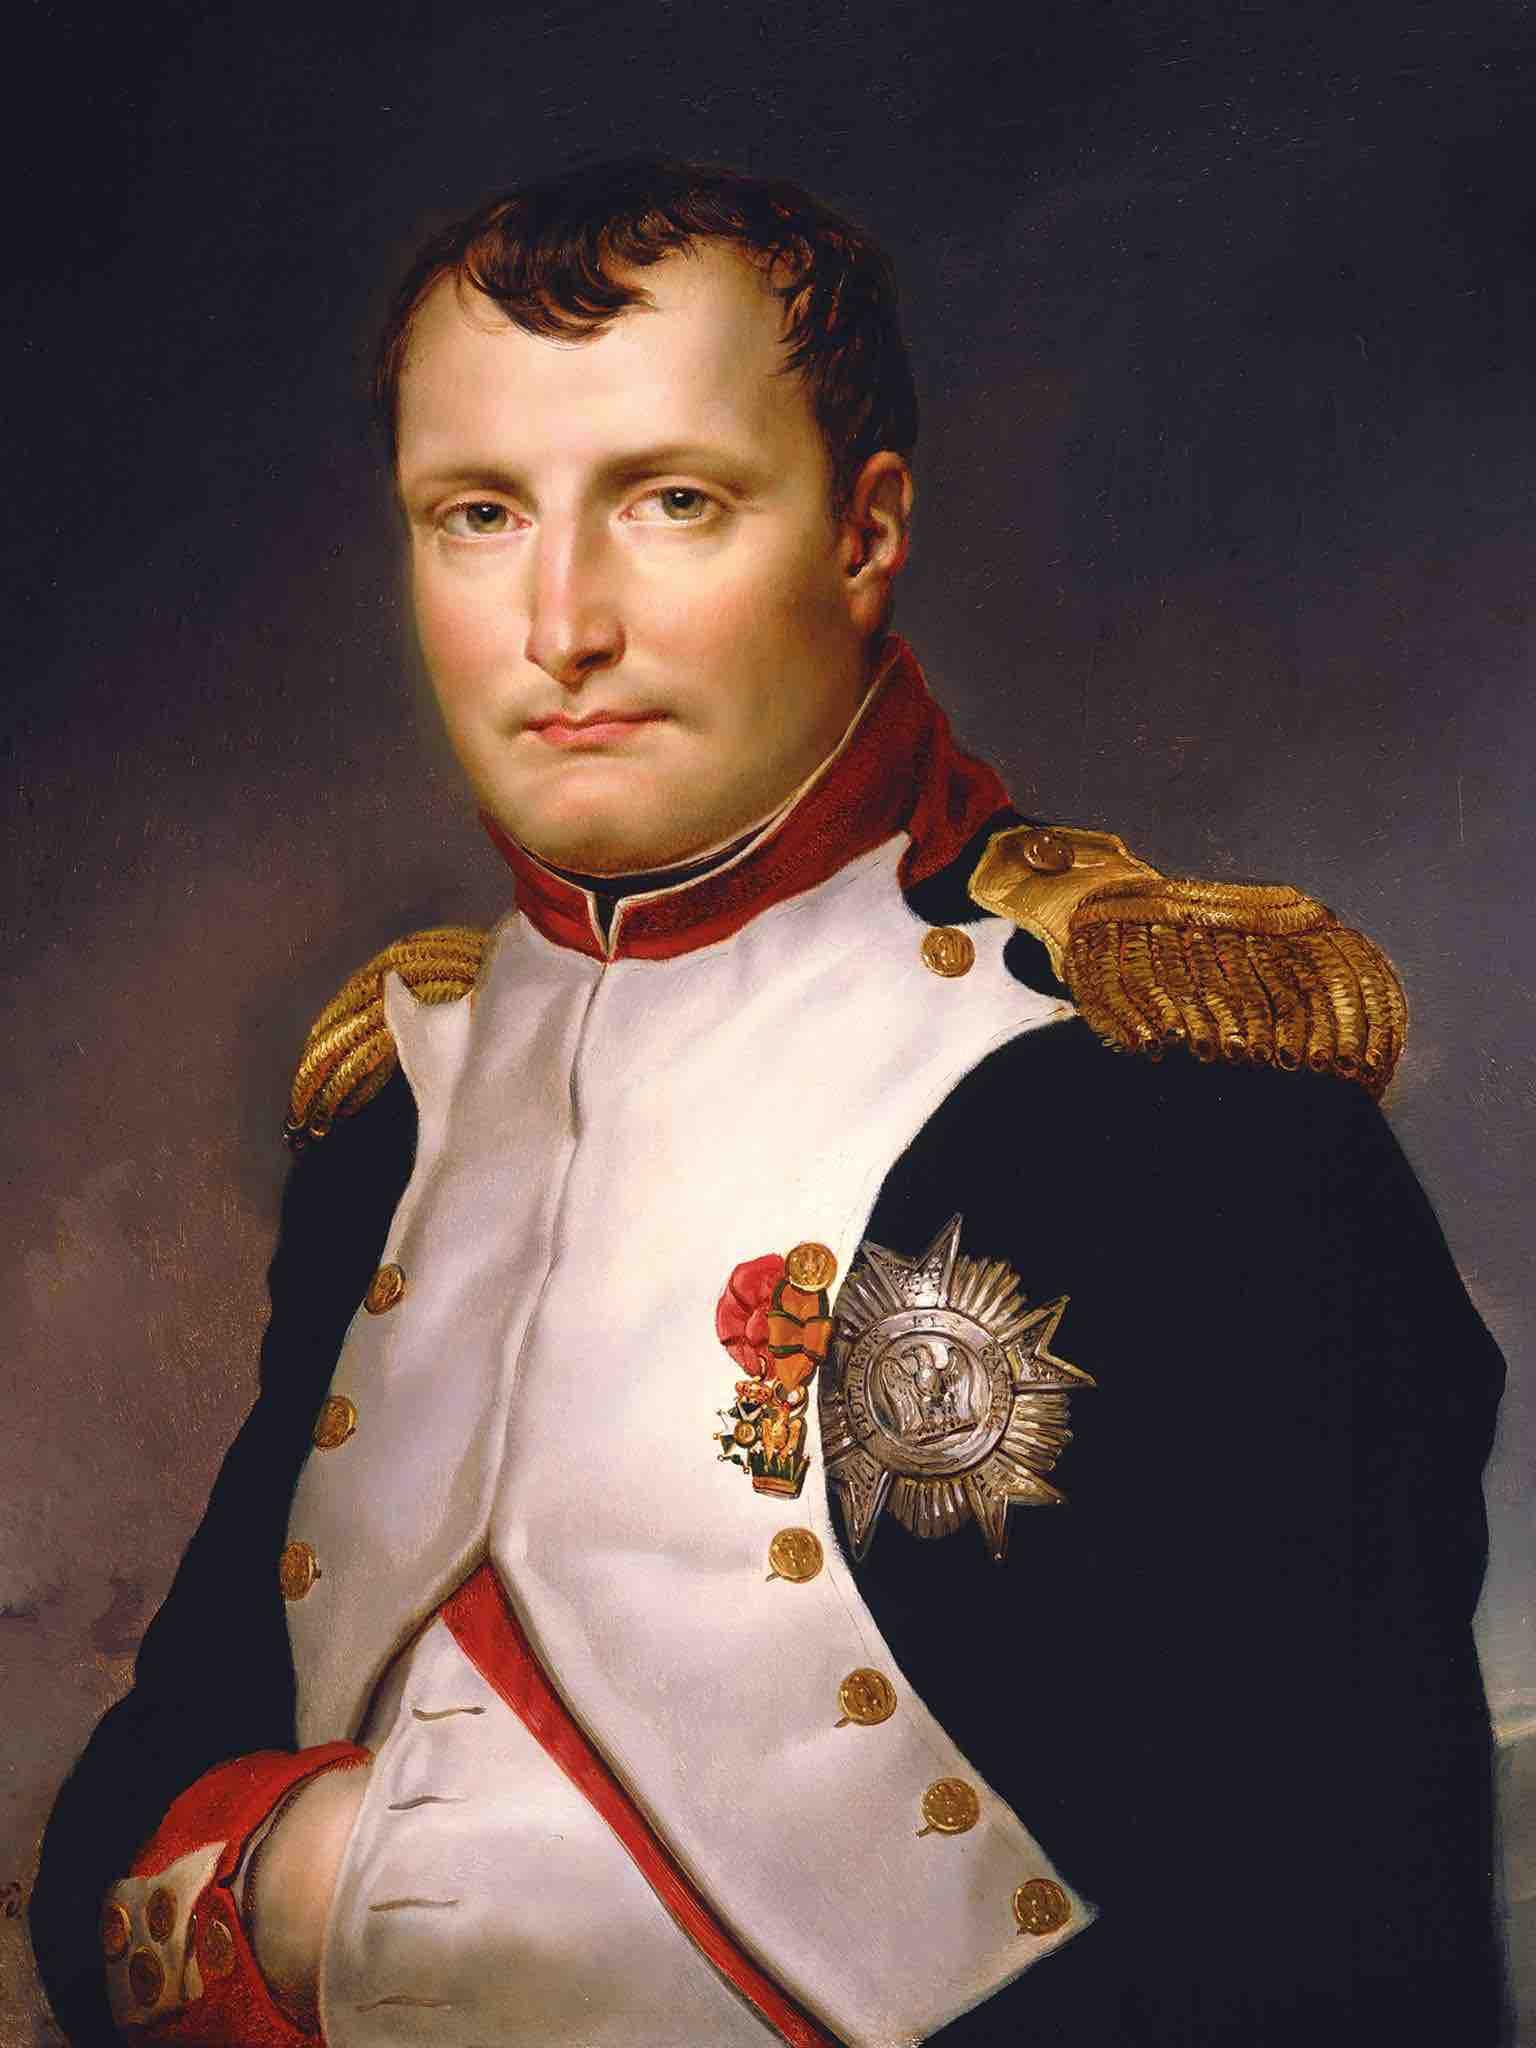 https://faithpro.org/wp-content/uploads/2017/10/Napoleon-Bonaparte-fp.jpg